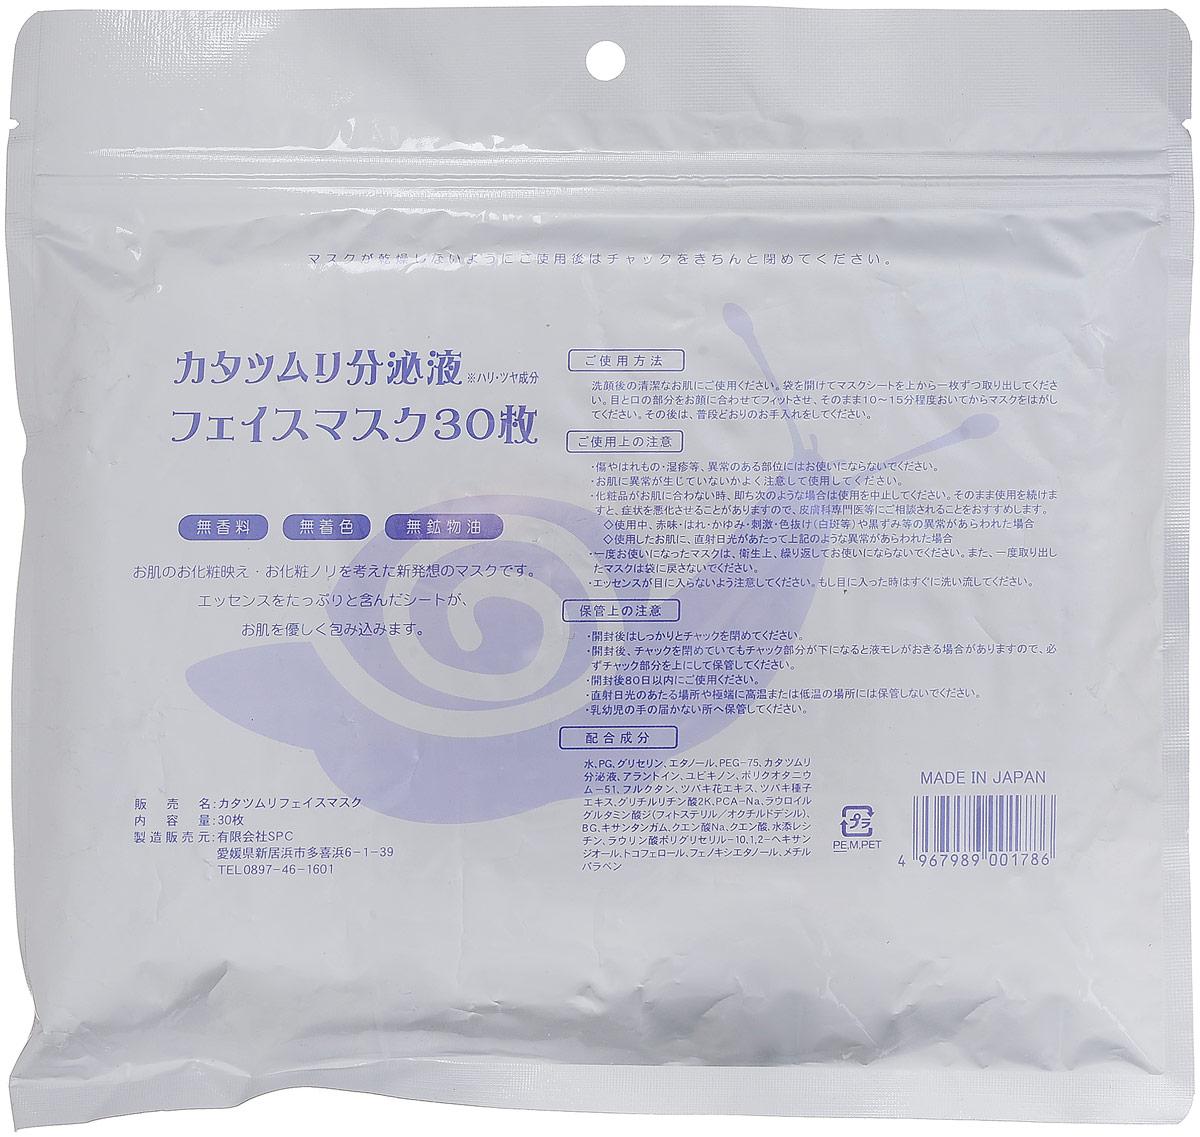 SPC Маска для лица Snail face mask (улитка), 30 шт